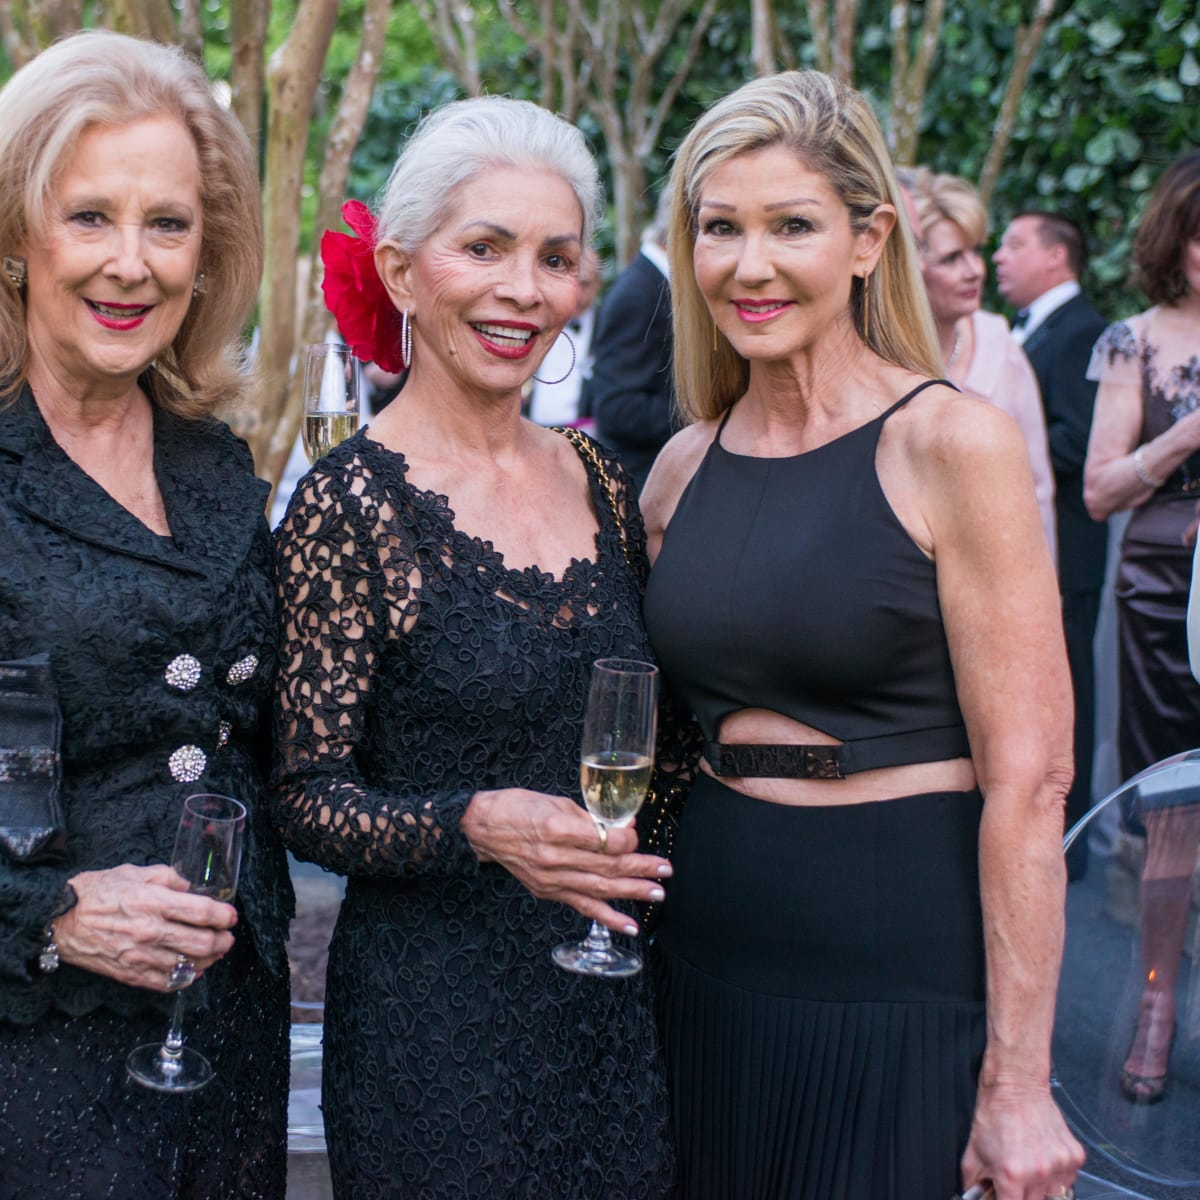 Van Cleef & Arpels party, April 2016, Mary Ann McKeithan, Henri Hall, Patti Murphy